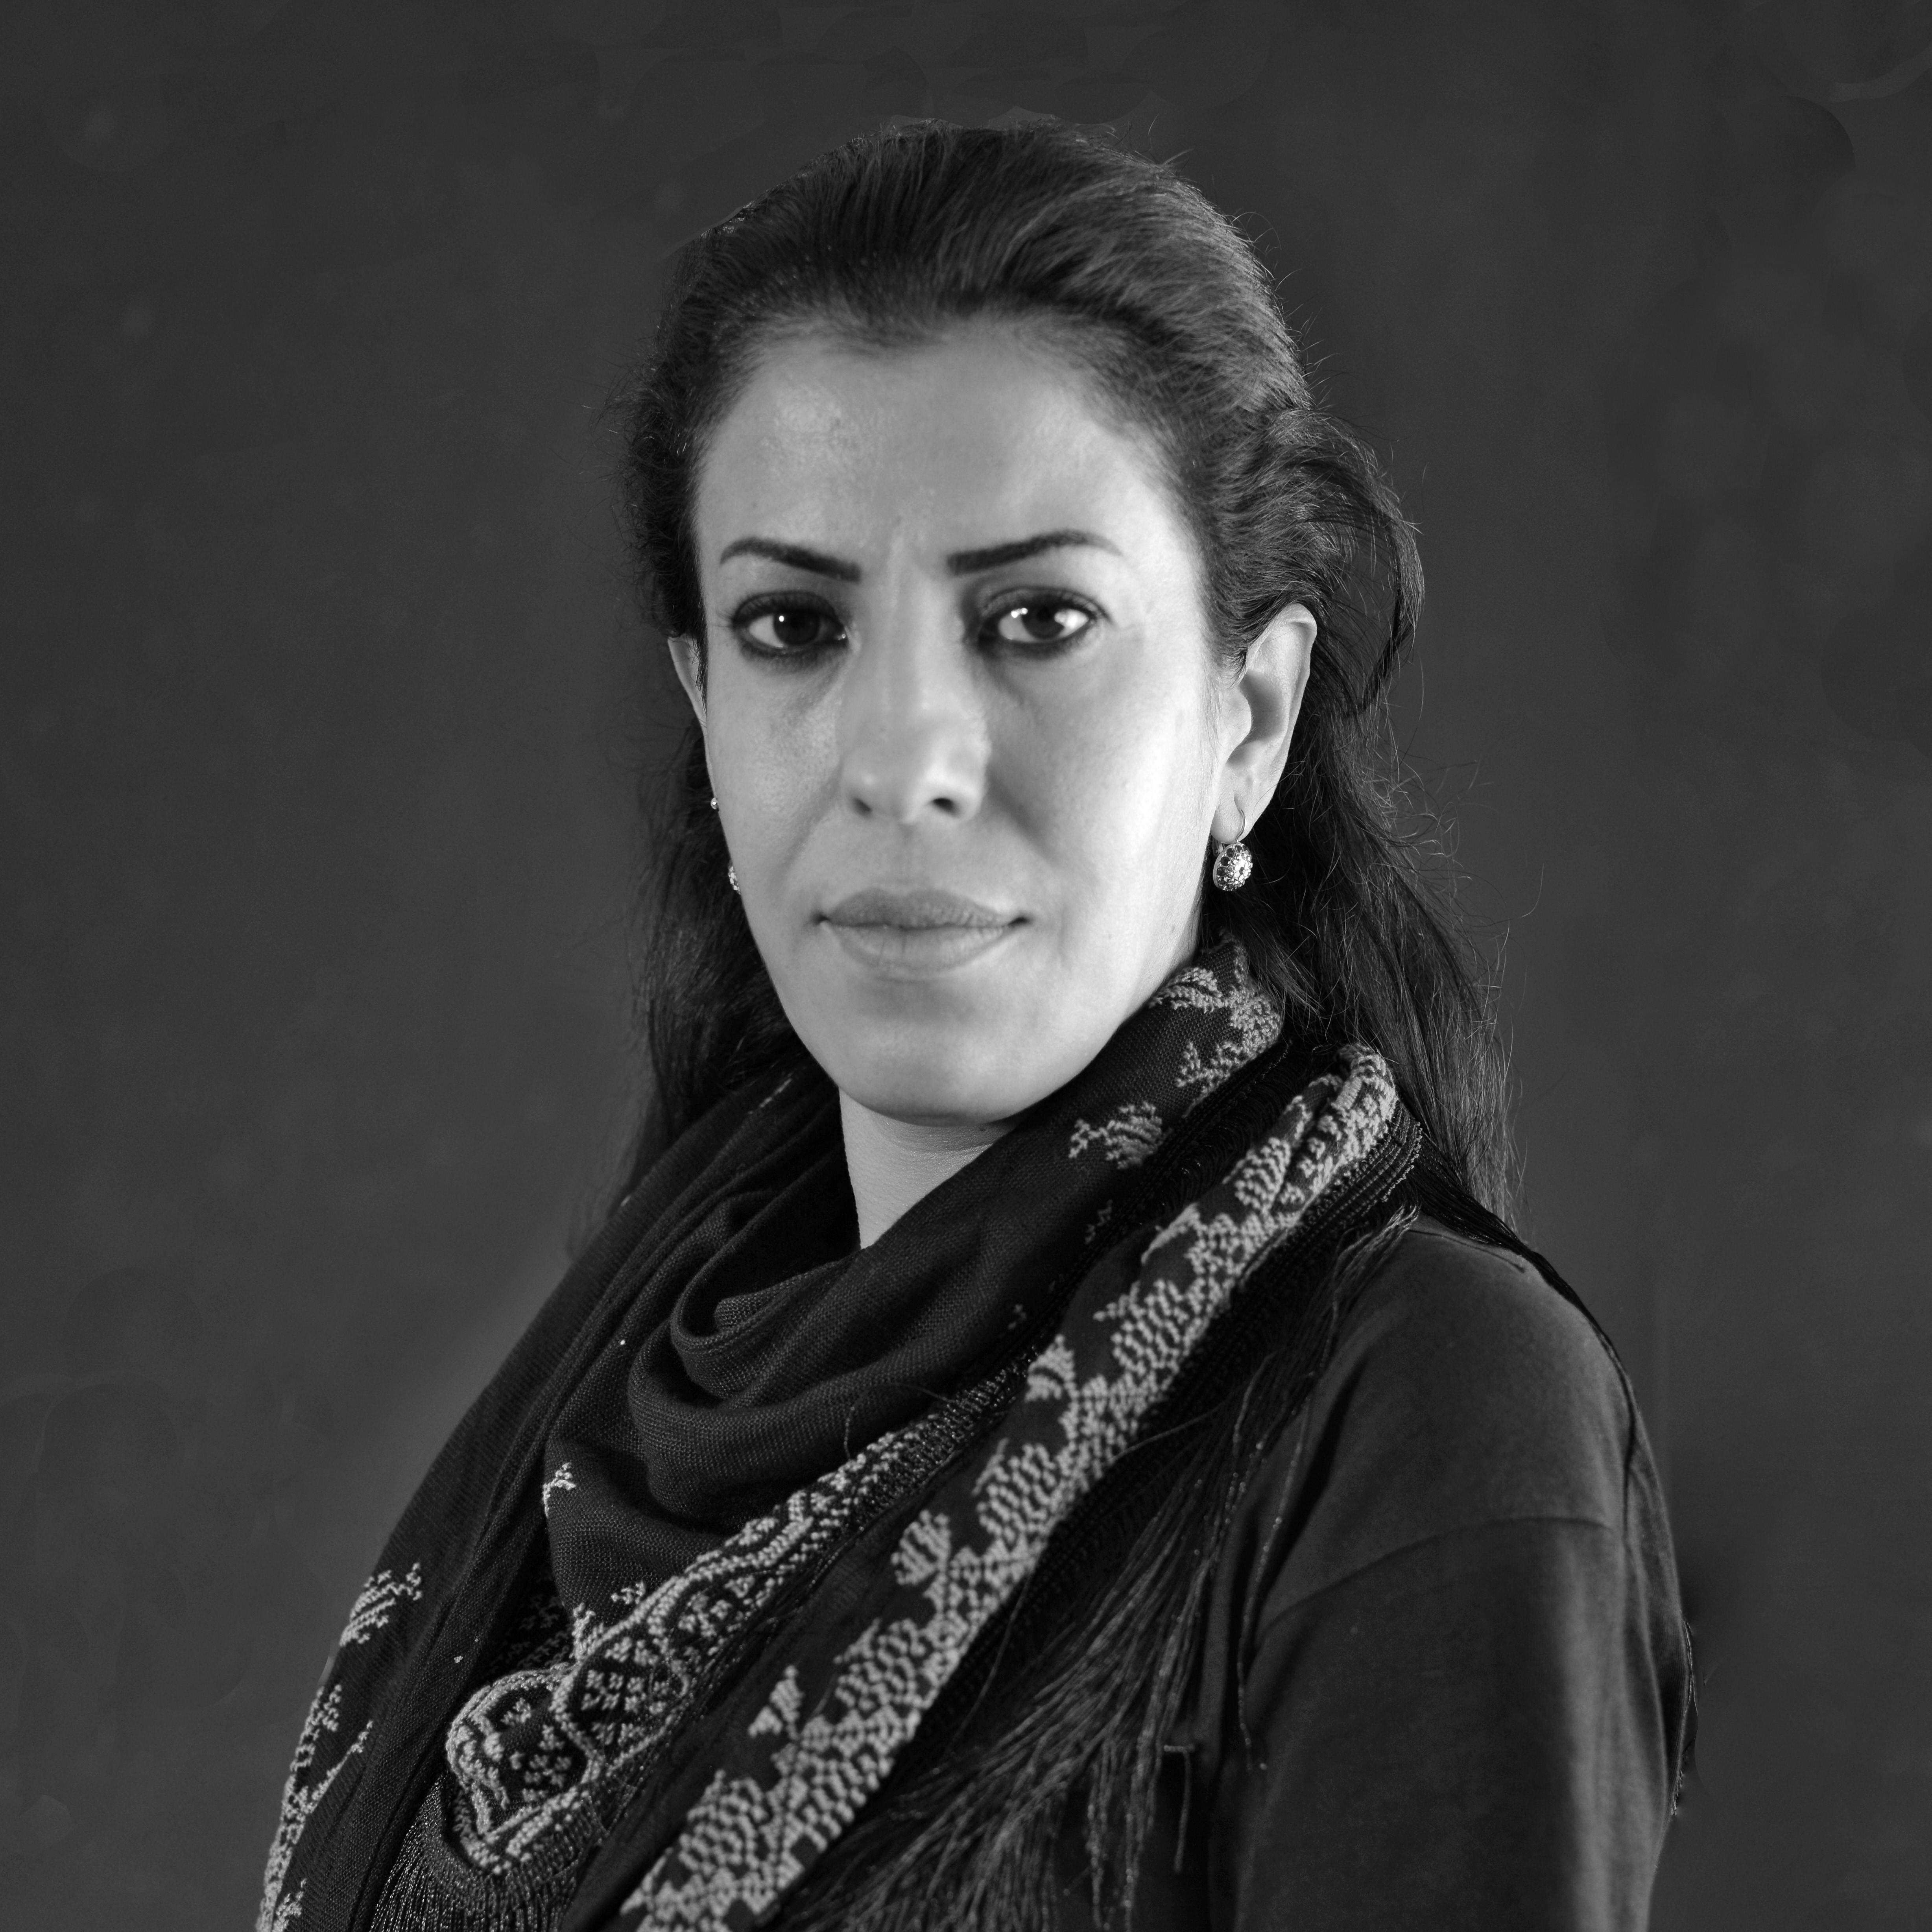 Fatima Abu Roomi